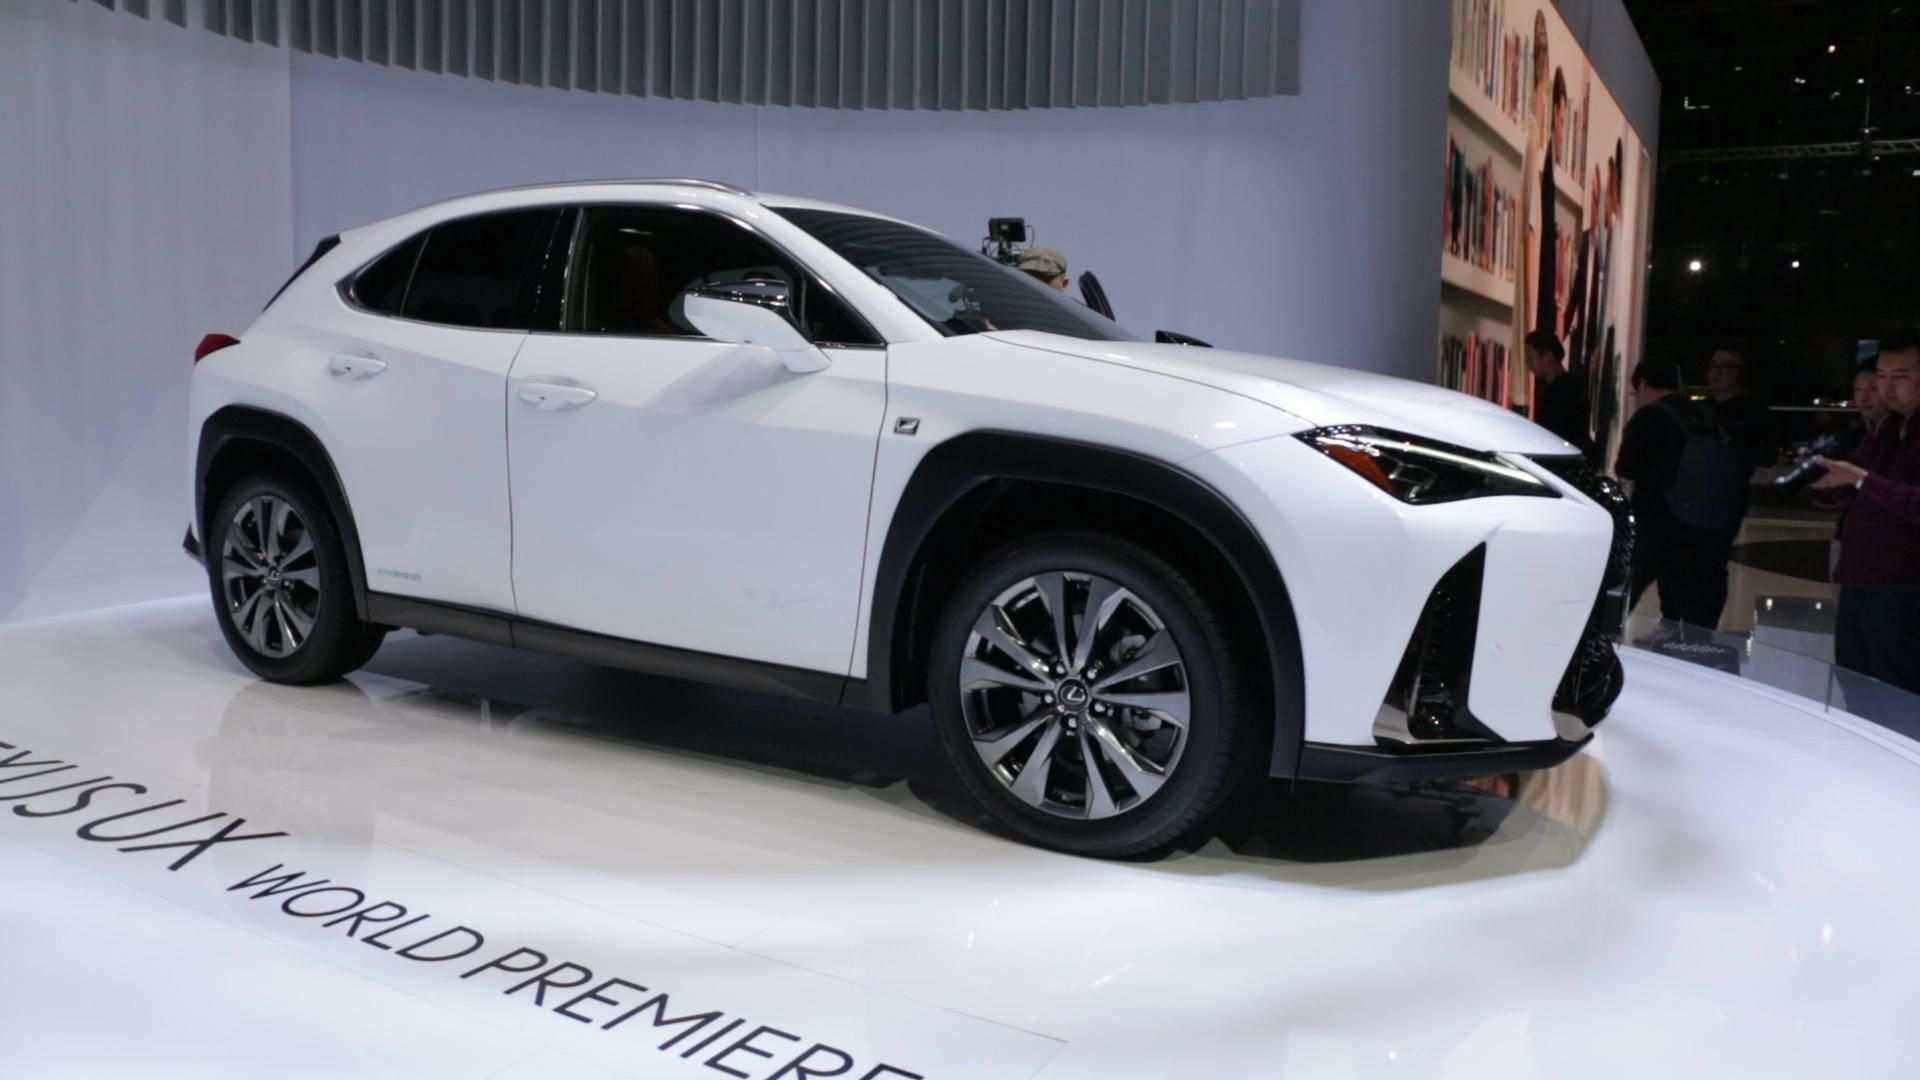 15 All New 2020 Lexus Ux Exterior Canada Rumors for 2020 Lexus Ux Exterior Canada